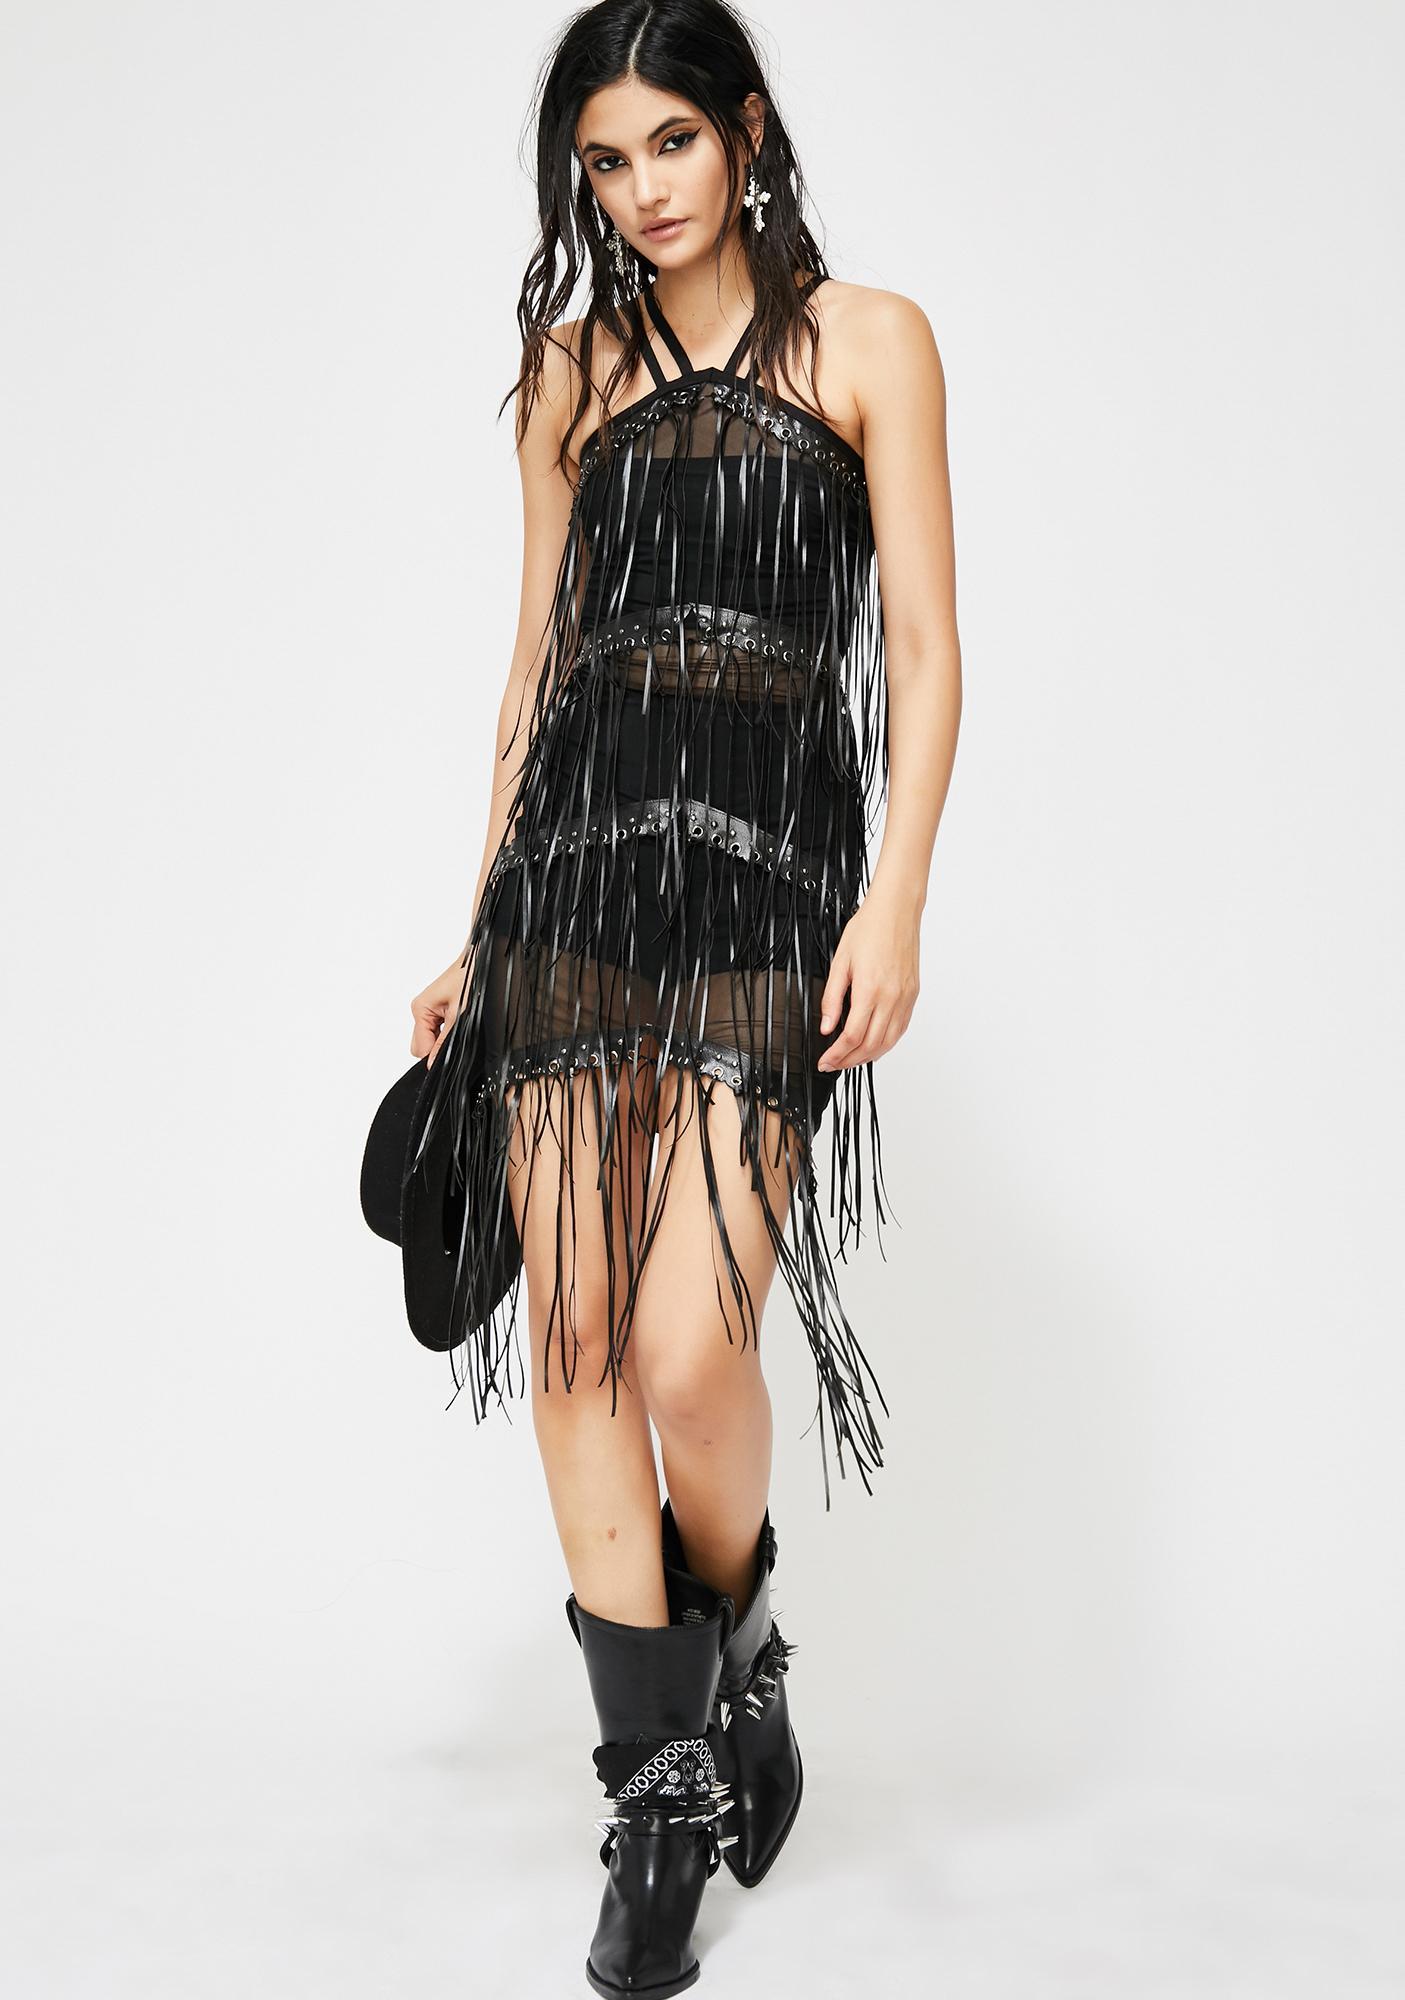 Desperado Sheer Fringe Dress